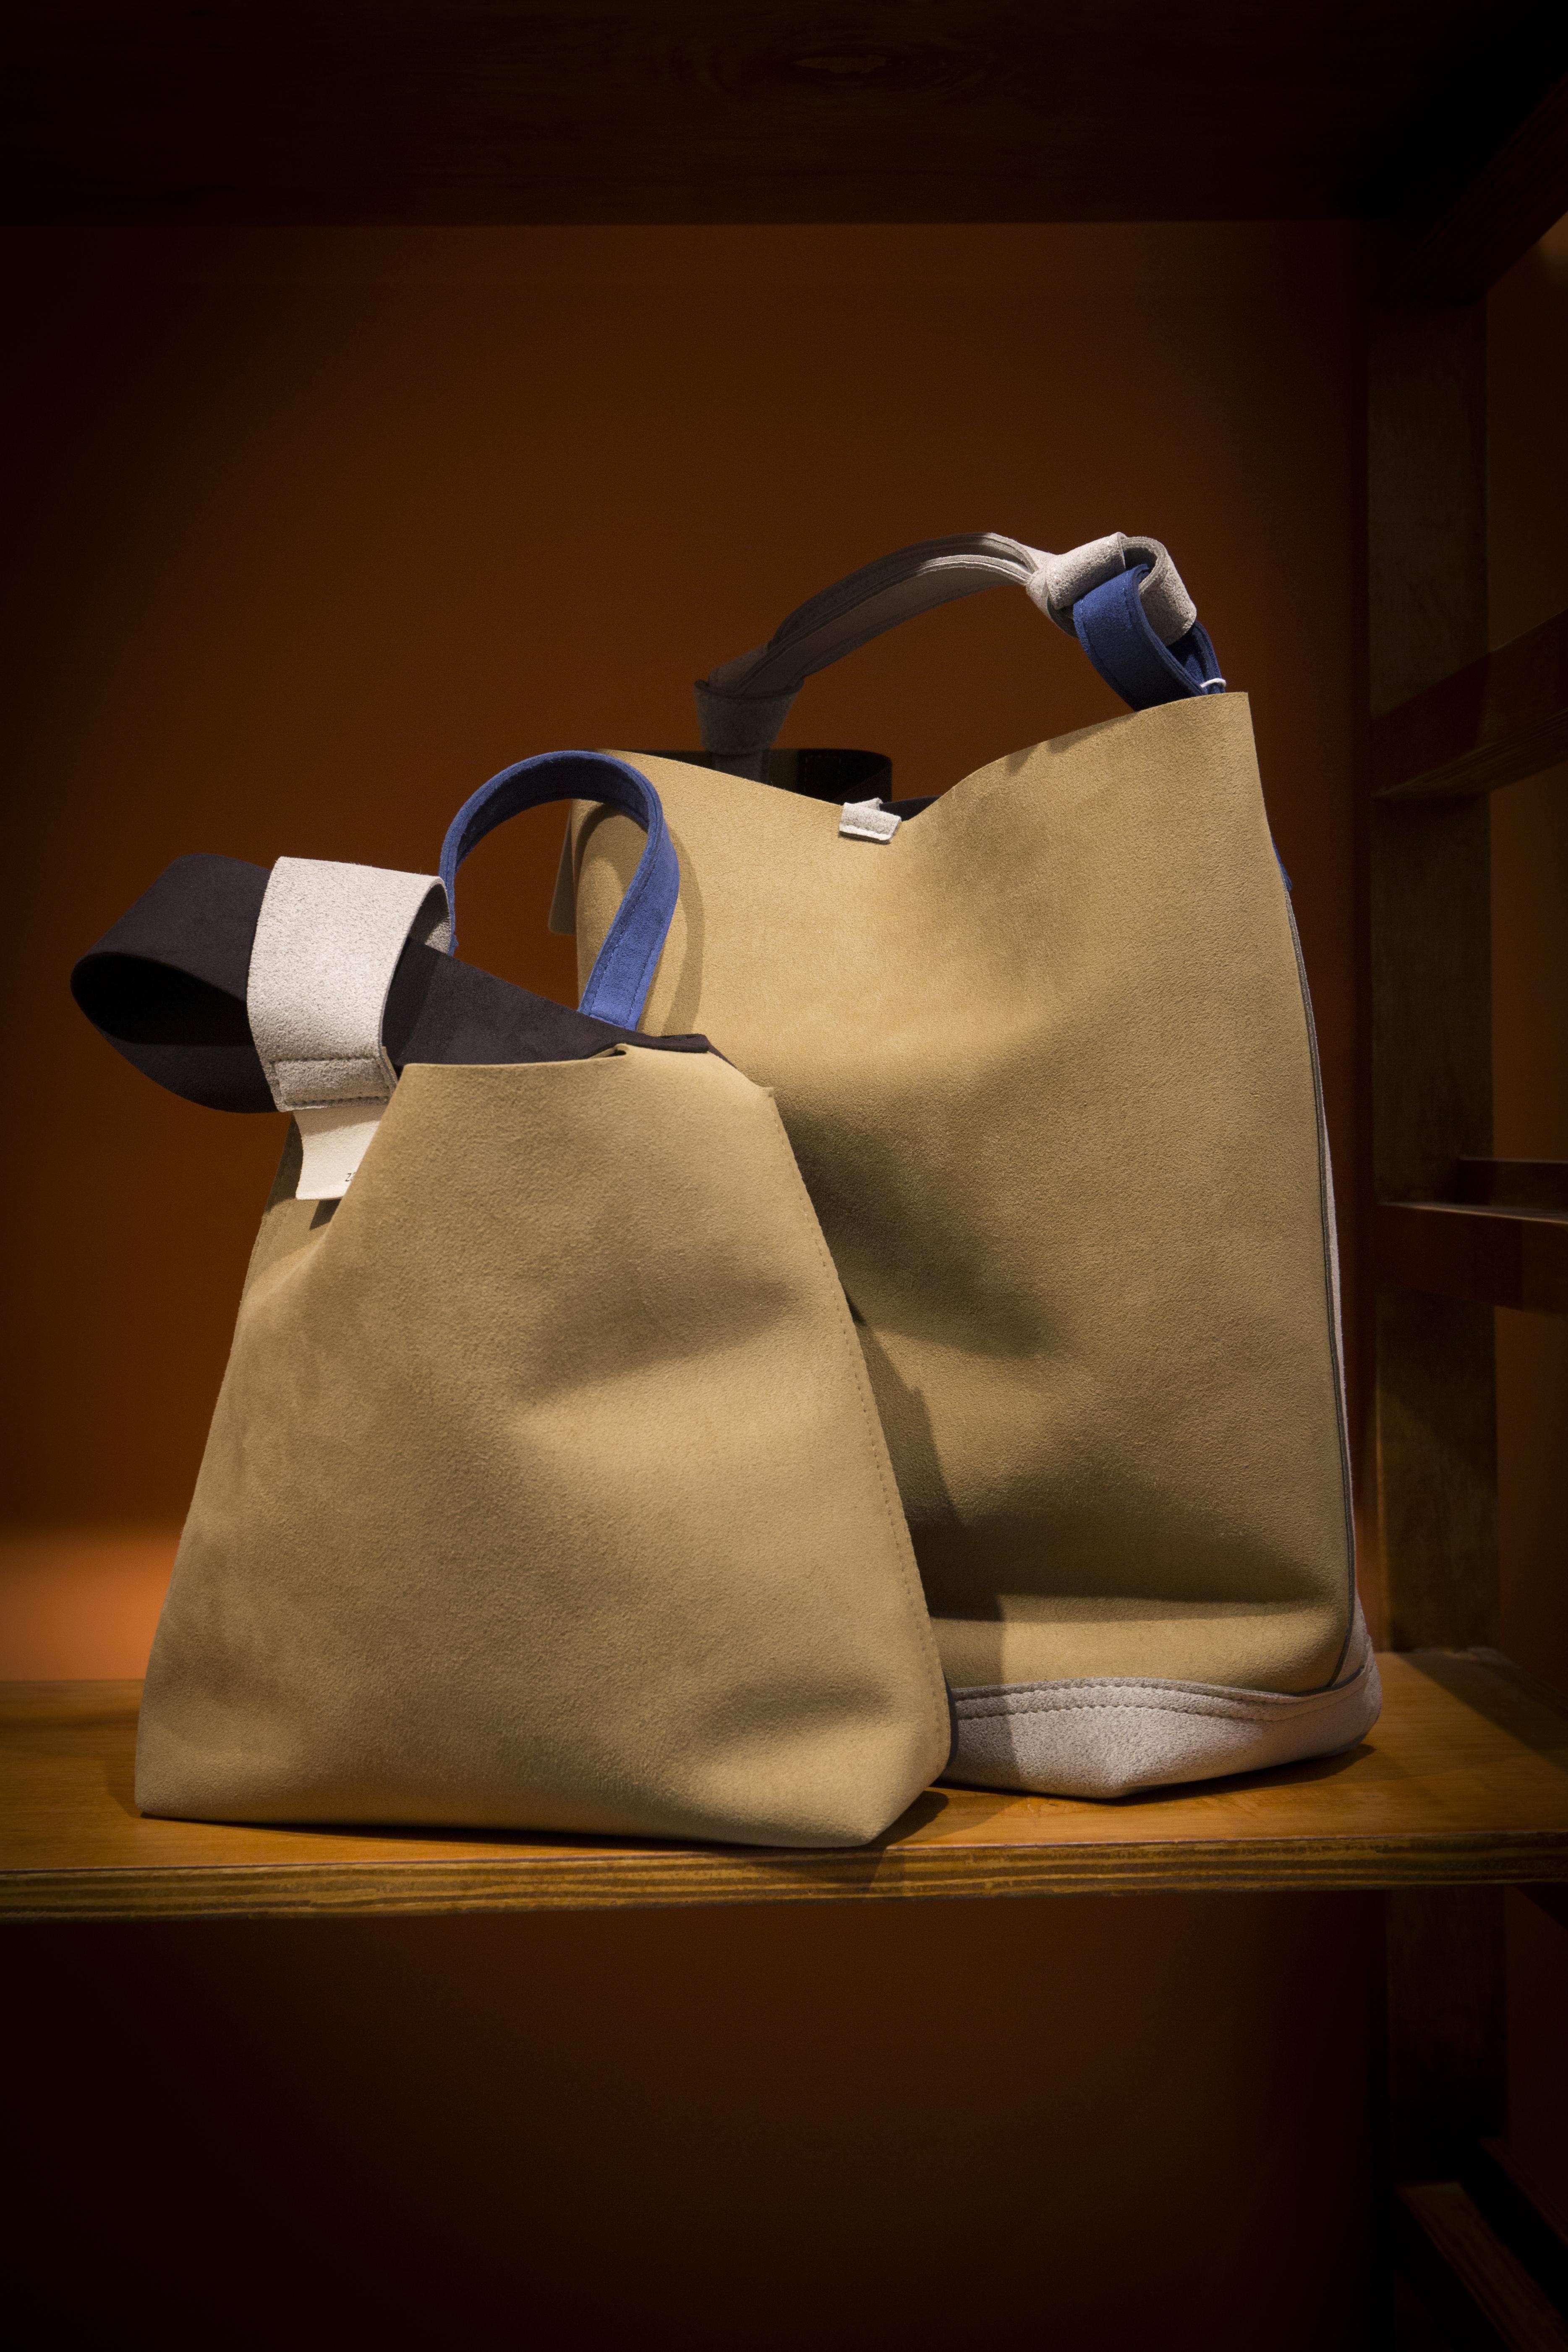 OKURA引進日本手袋品牌ZATTU,手袋採用品牌最著名的物料Microfiber Suede超細纖維絨面打造,不但非常輕身,而且抗磨耐用。 ZATTU BAG $1,980 (左)/ $3,480 (右)